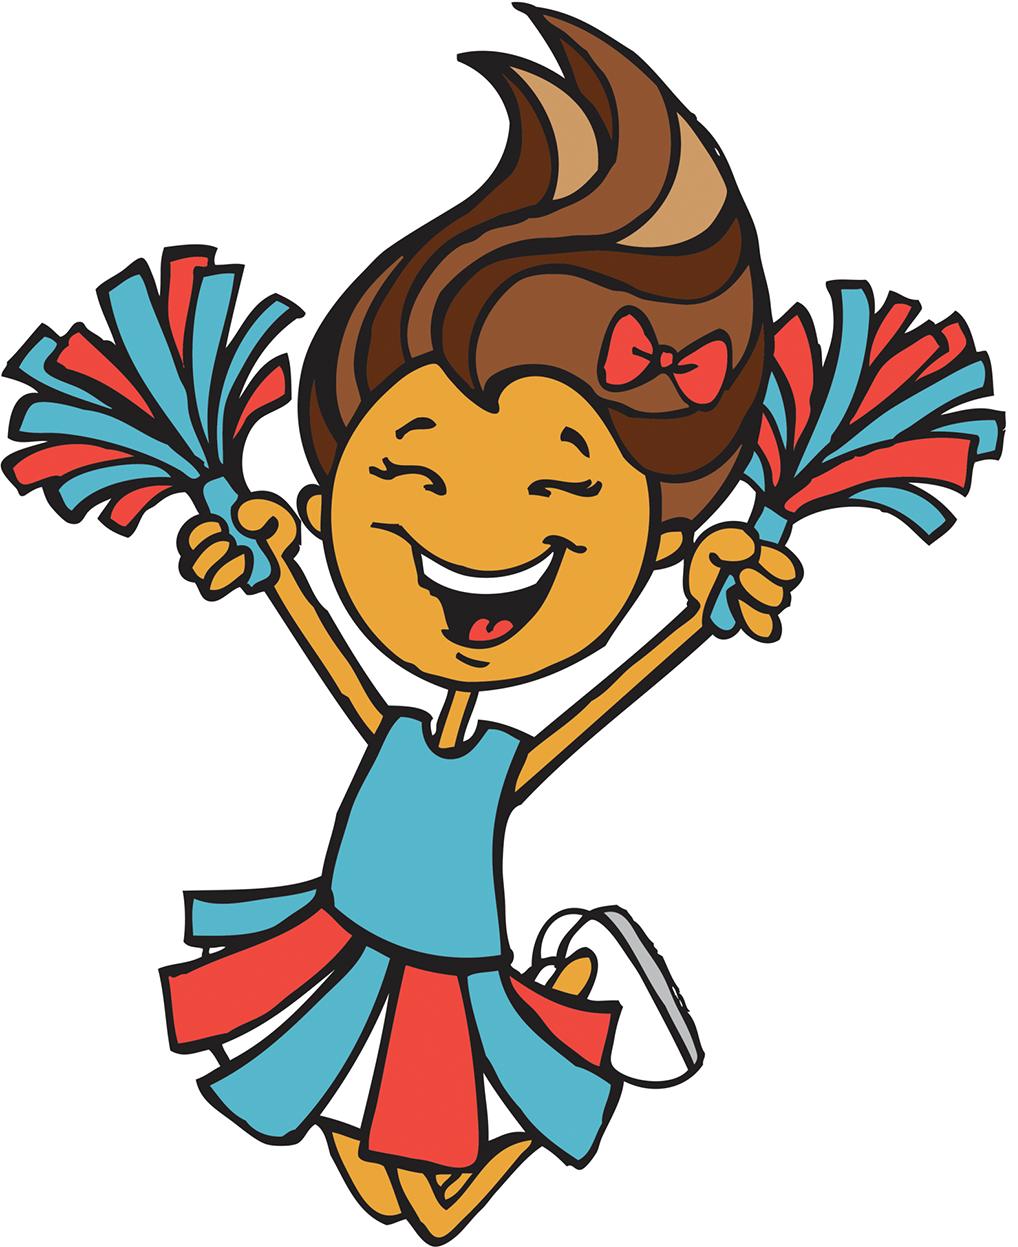 Halloween cheerleader clipart image royalty free library Cheerleader Cartoon Illustration - Cheerleaders cheerleaders 1018 ... image royalty free library